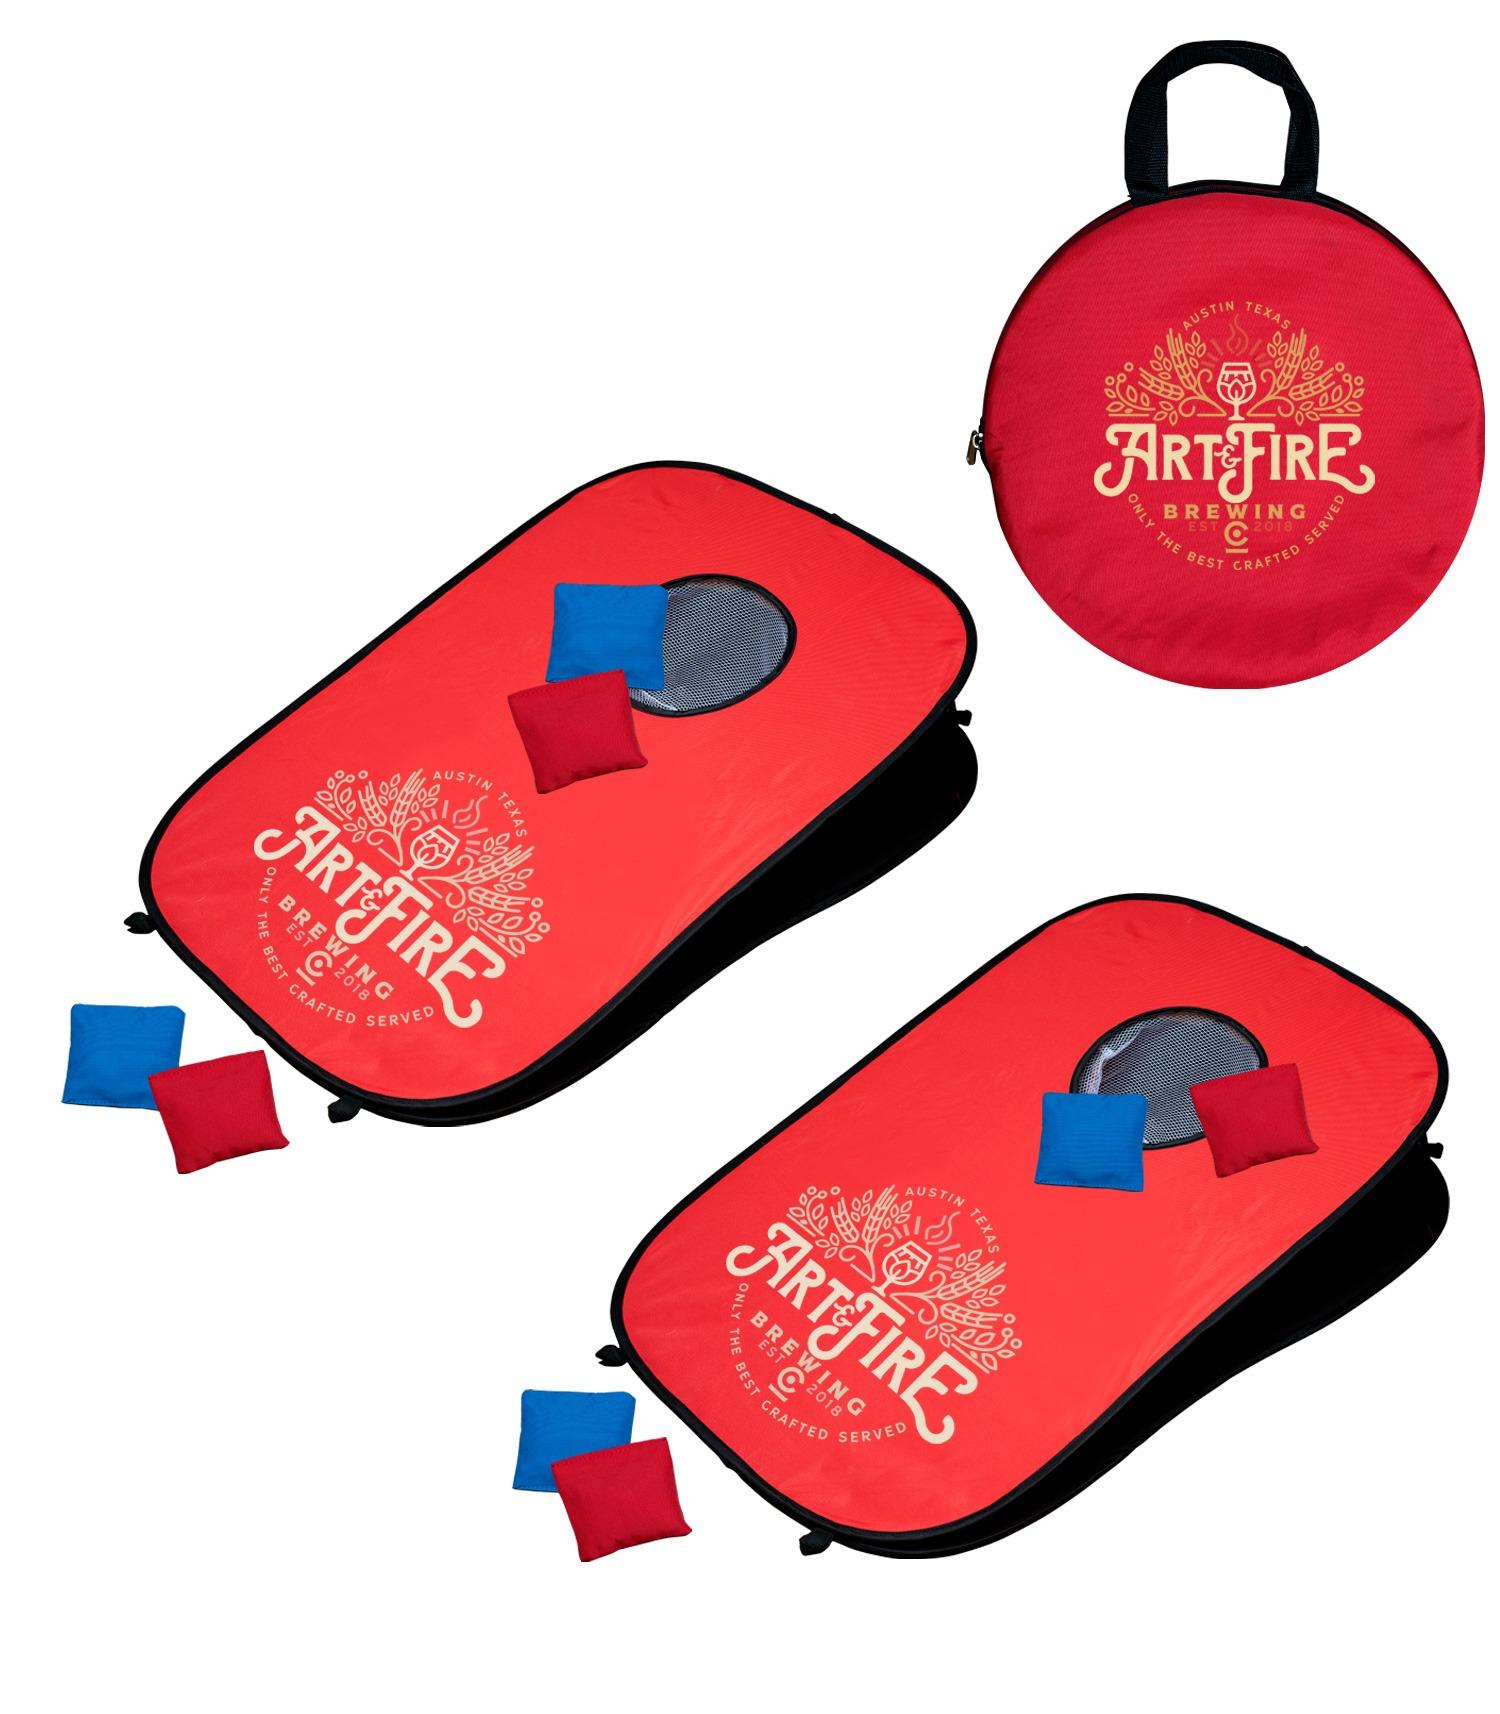 346443834-154 - Portable Pop-Up Cornhole Set - thumbnail